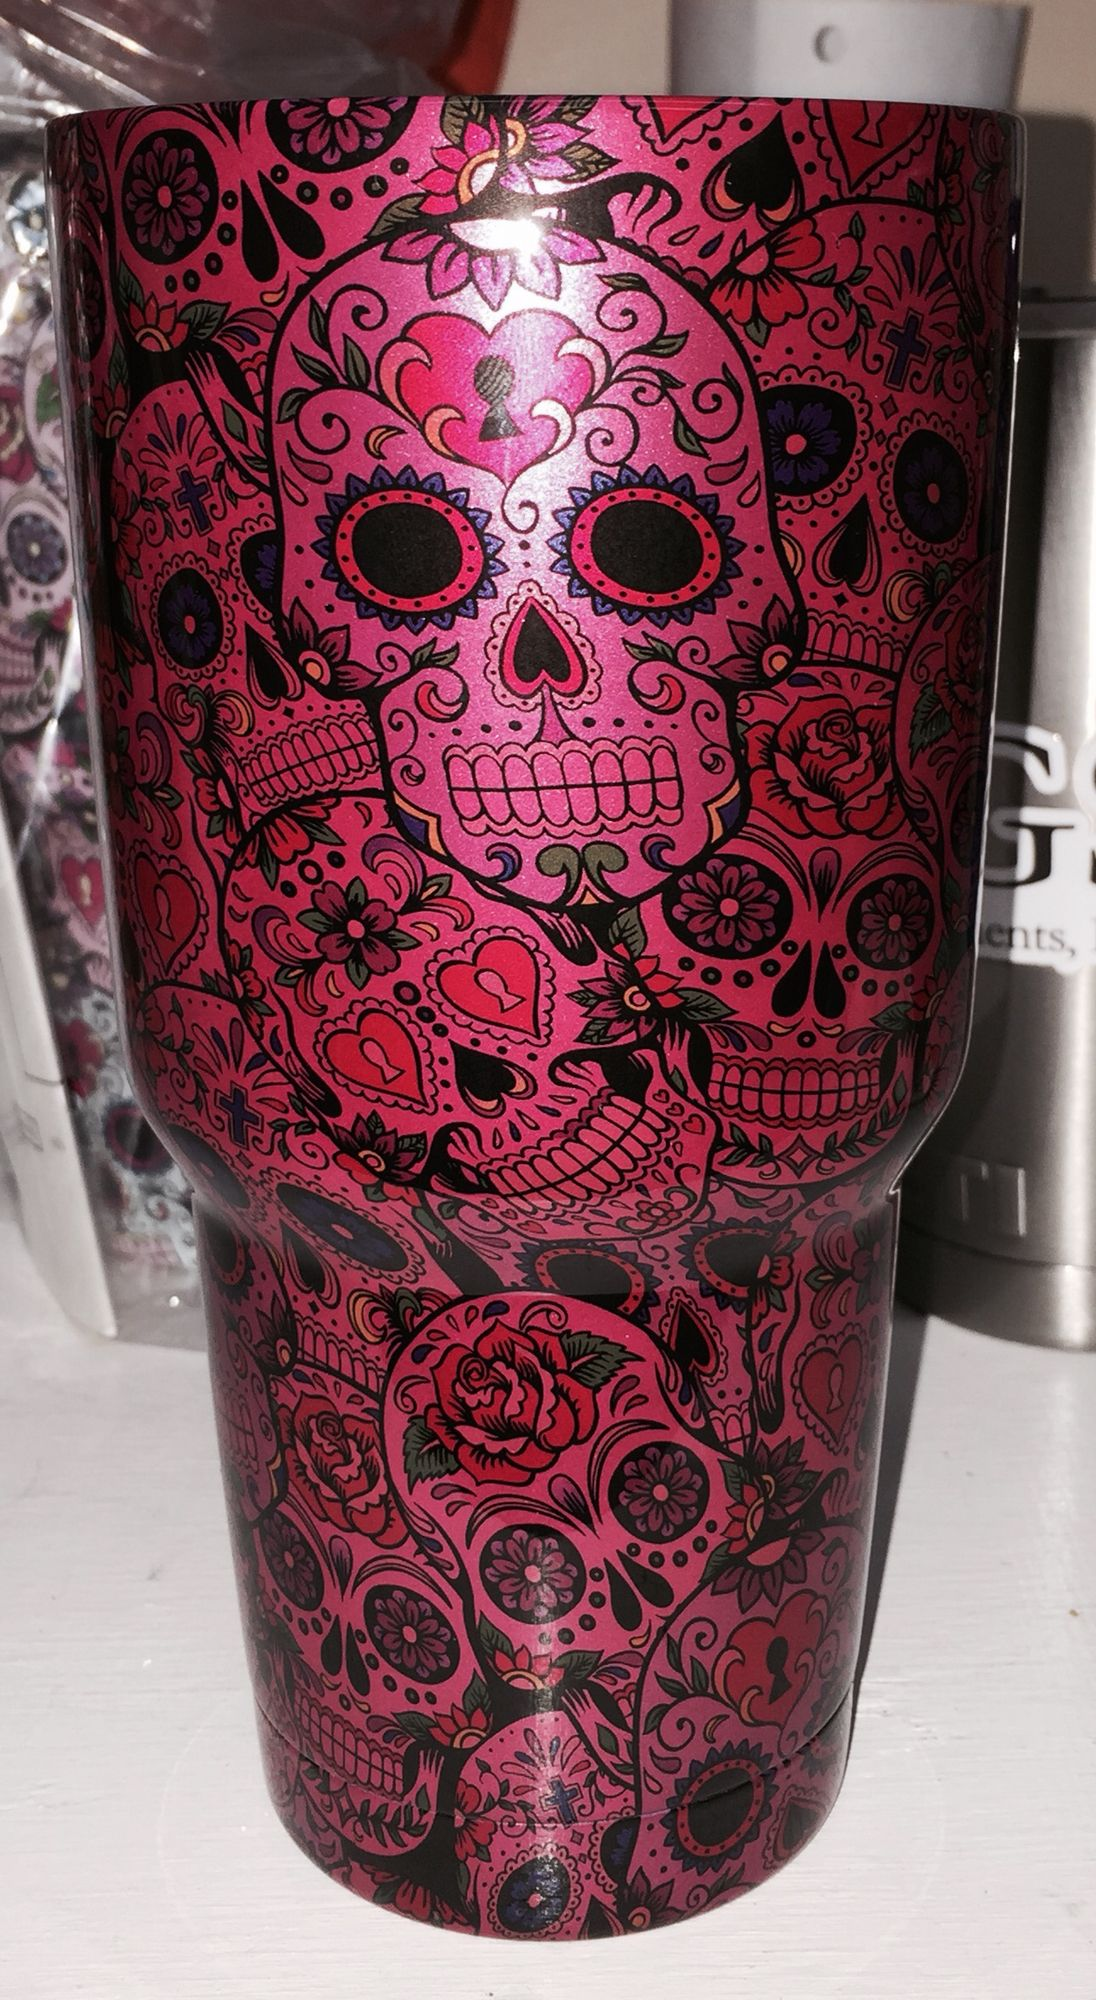 Metallic pink sugar skulls 30oz Yeti cup Lonestar Concepts & Design lonestarjess15@yahoo.com